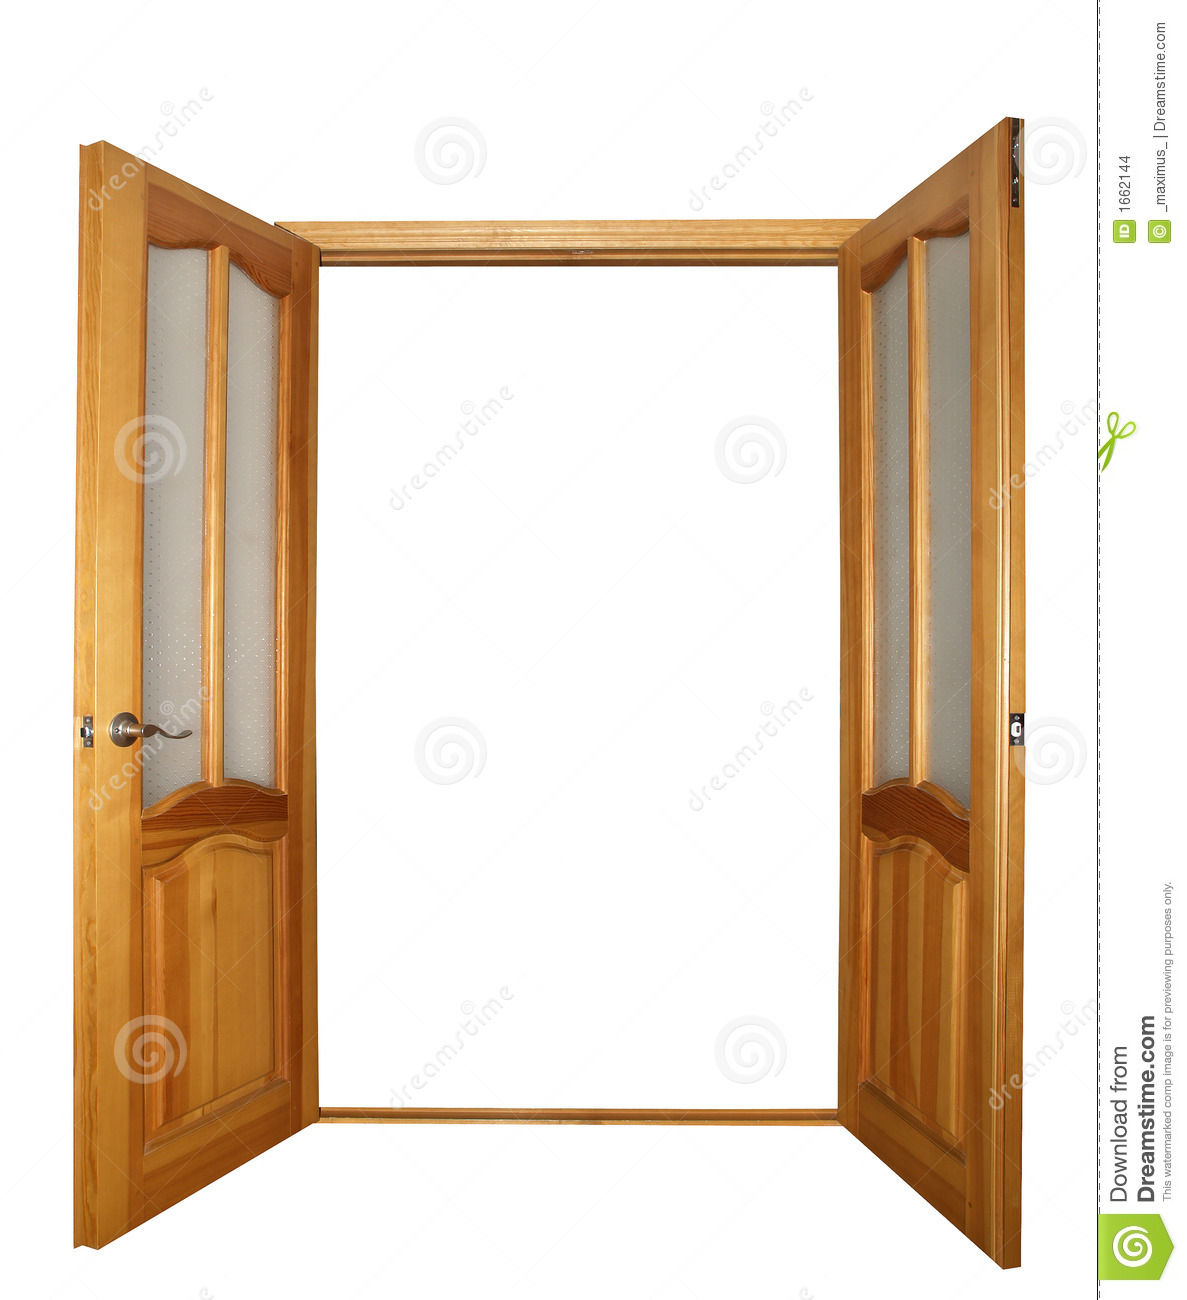 Closed double door clipart png transparent stock Closed Double Door Clipart Inspiration 22109 Doors - hyunky.com png transparent stock